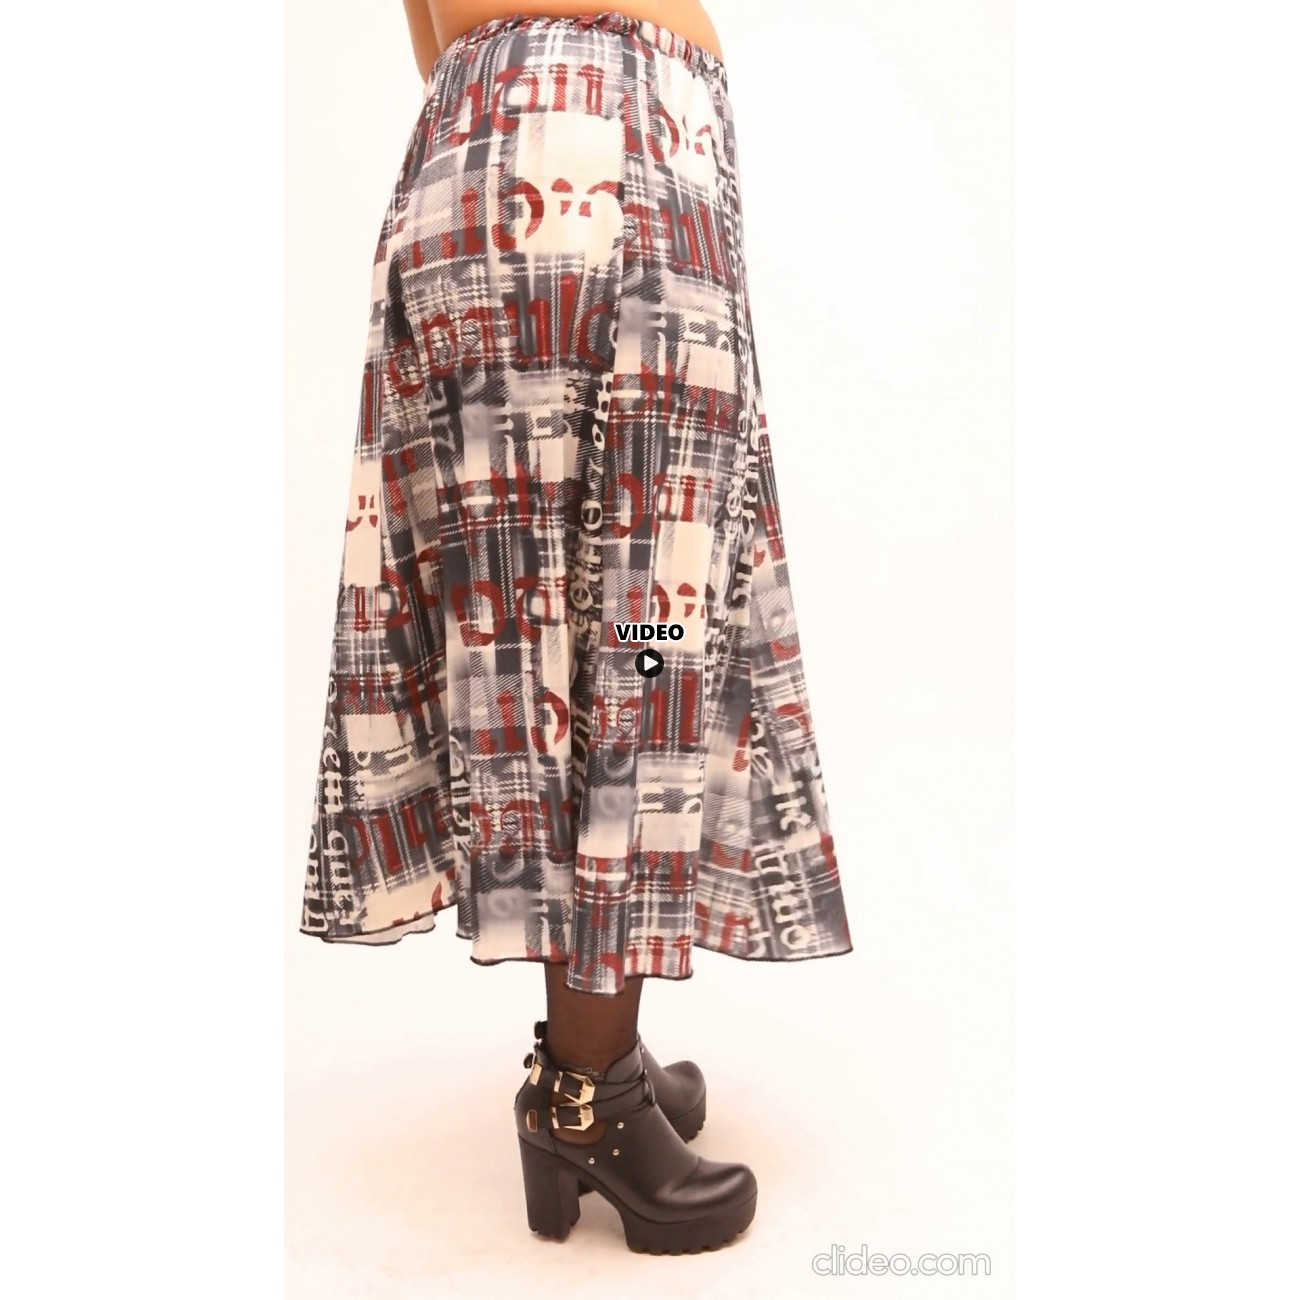 B21-1060 Closh Skirt with elastic band